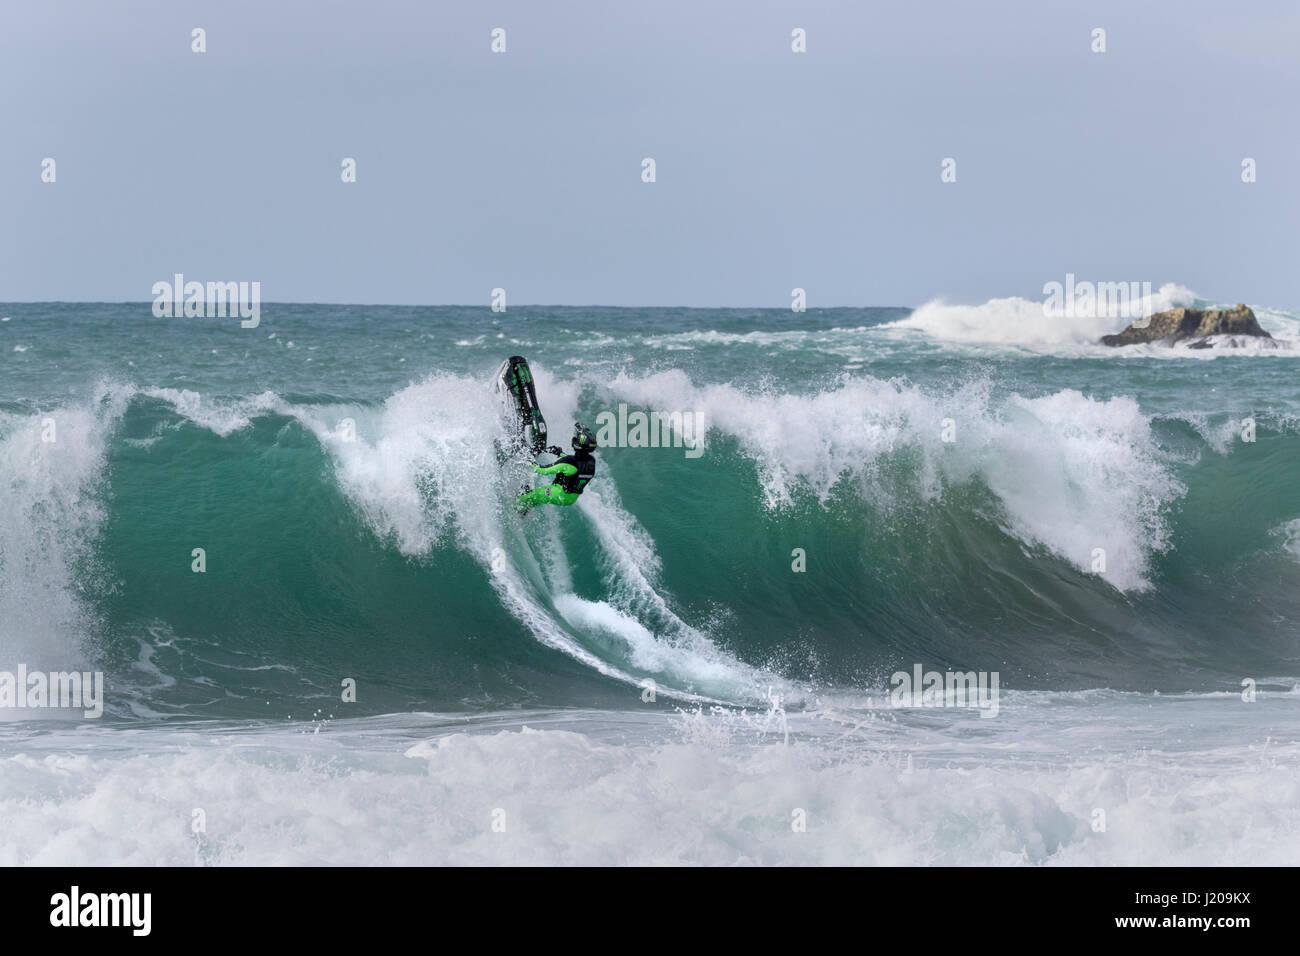 Jet Ski tricks, Atlantic Ocean, Portugal, Europe - Stock Image